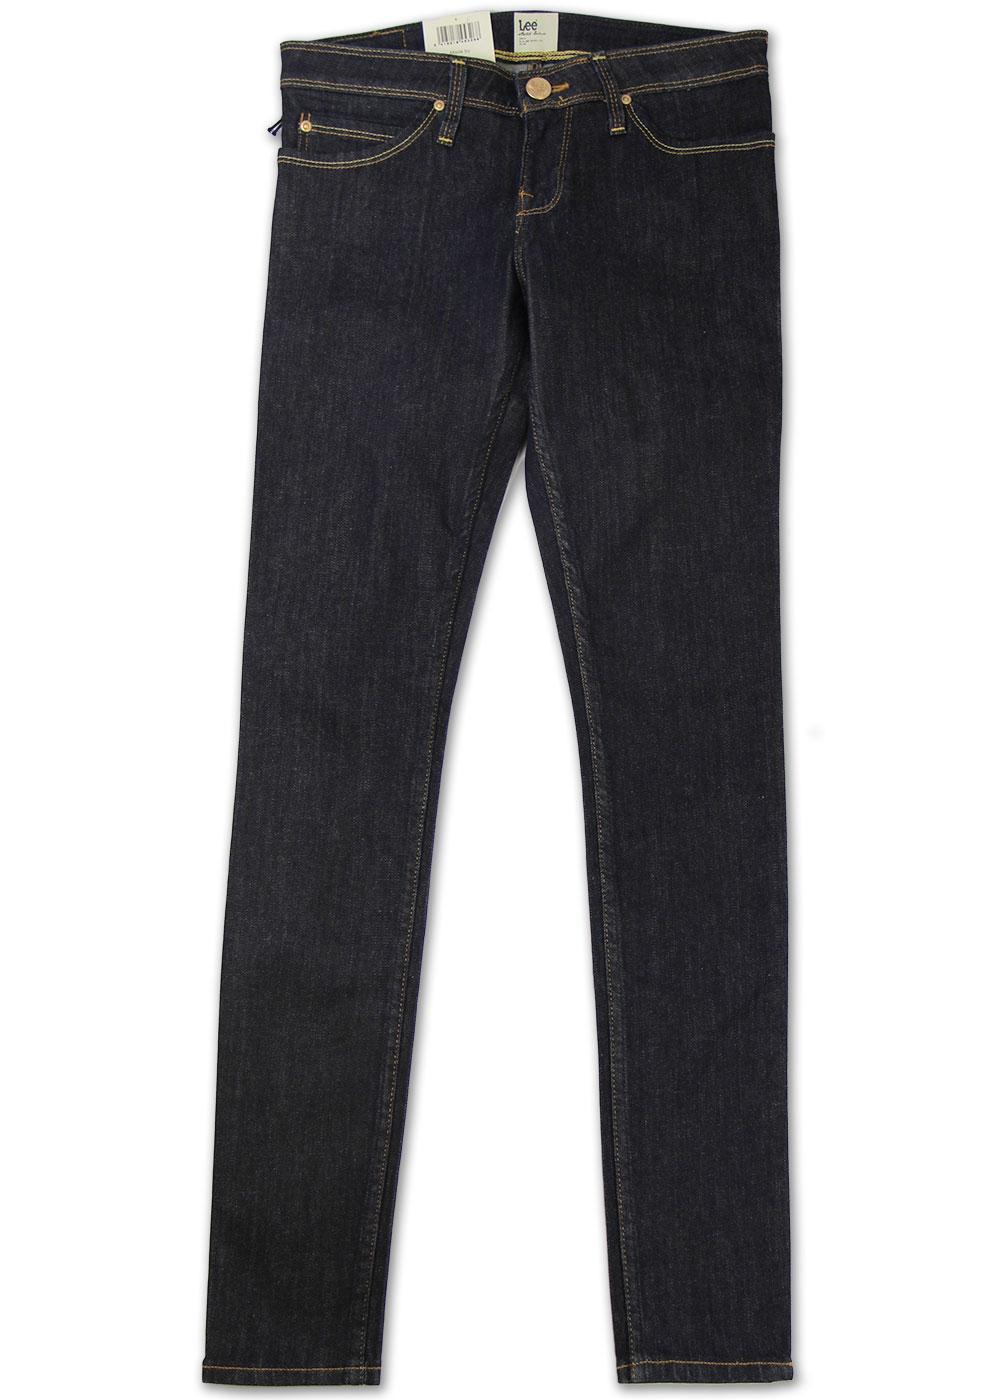 Toxey LEE Retro One Wash Super Skinny Denim Jeans